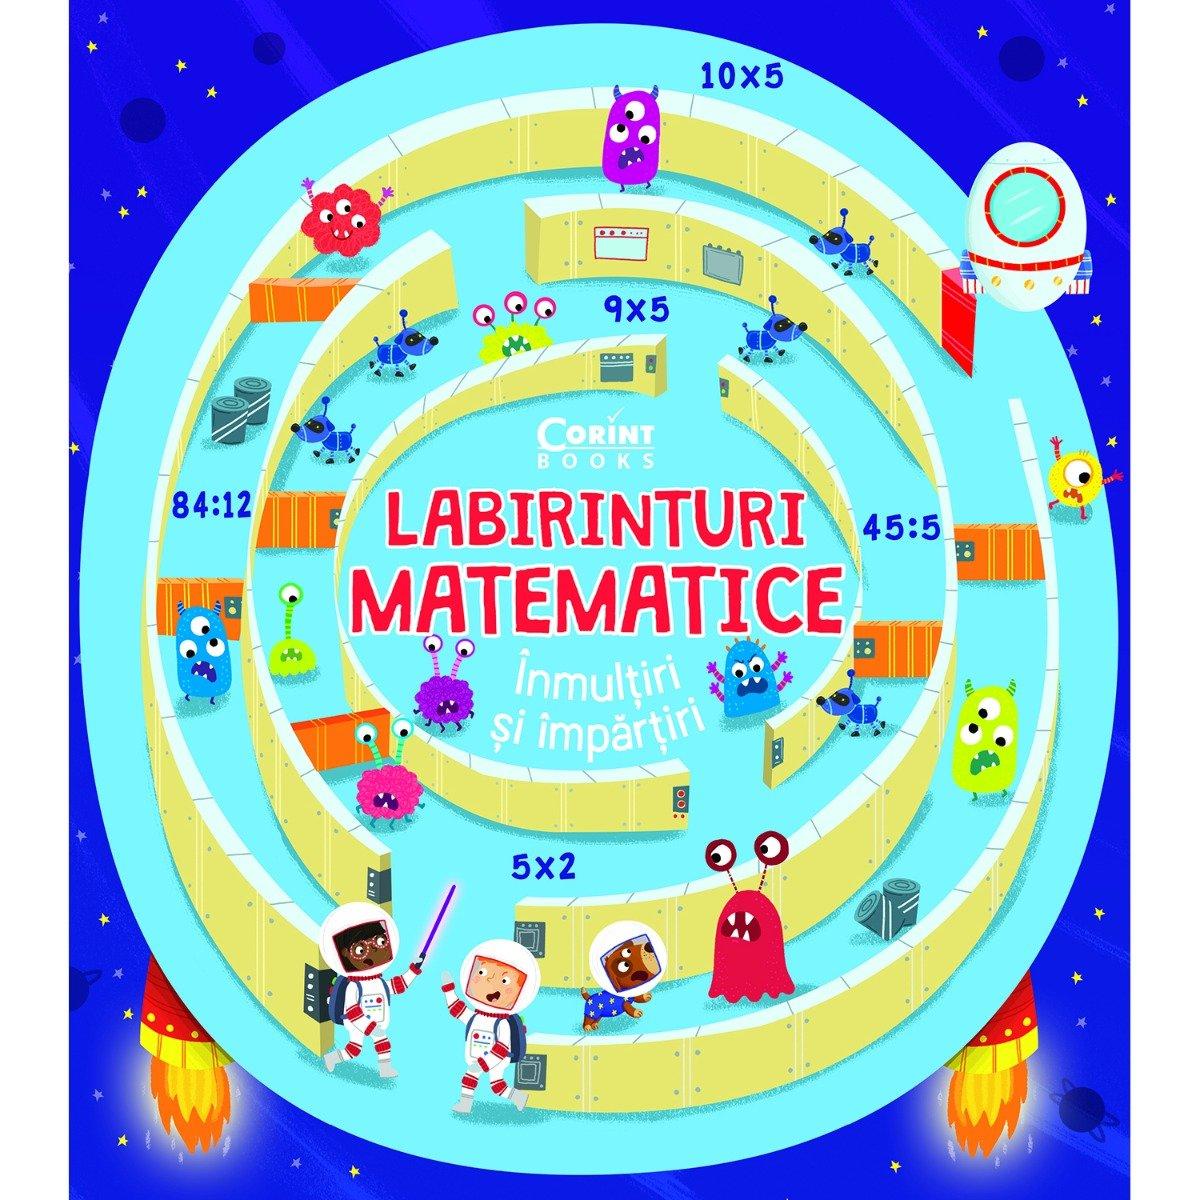 Carte Editura Corint, Labirinturi matematice. Inmultiri si impartiri, Angelika Scudamore